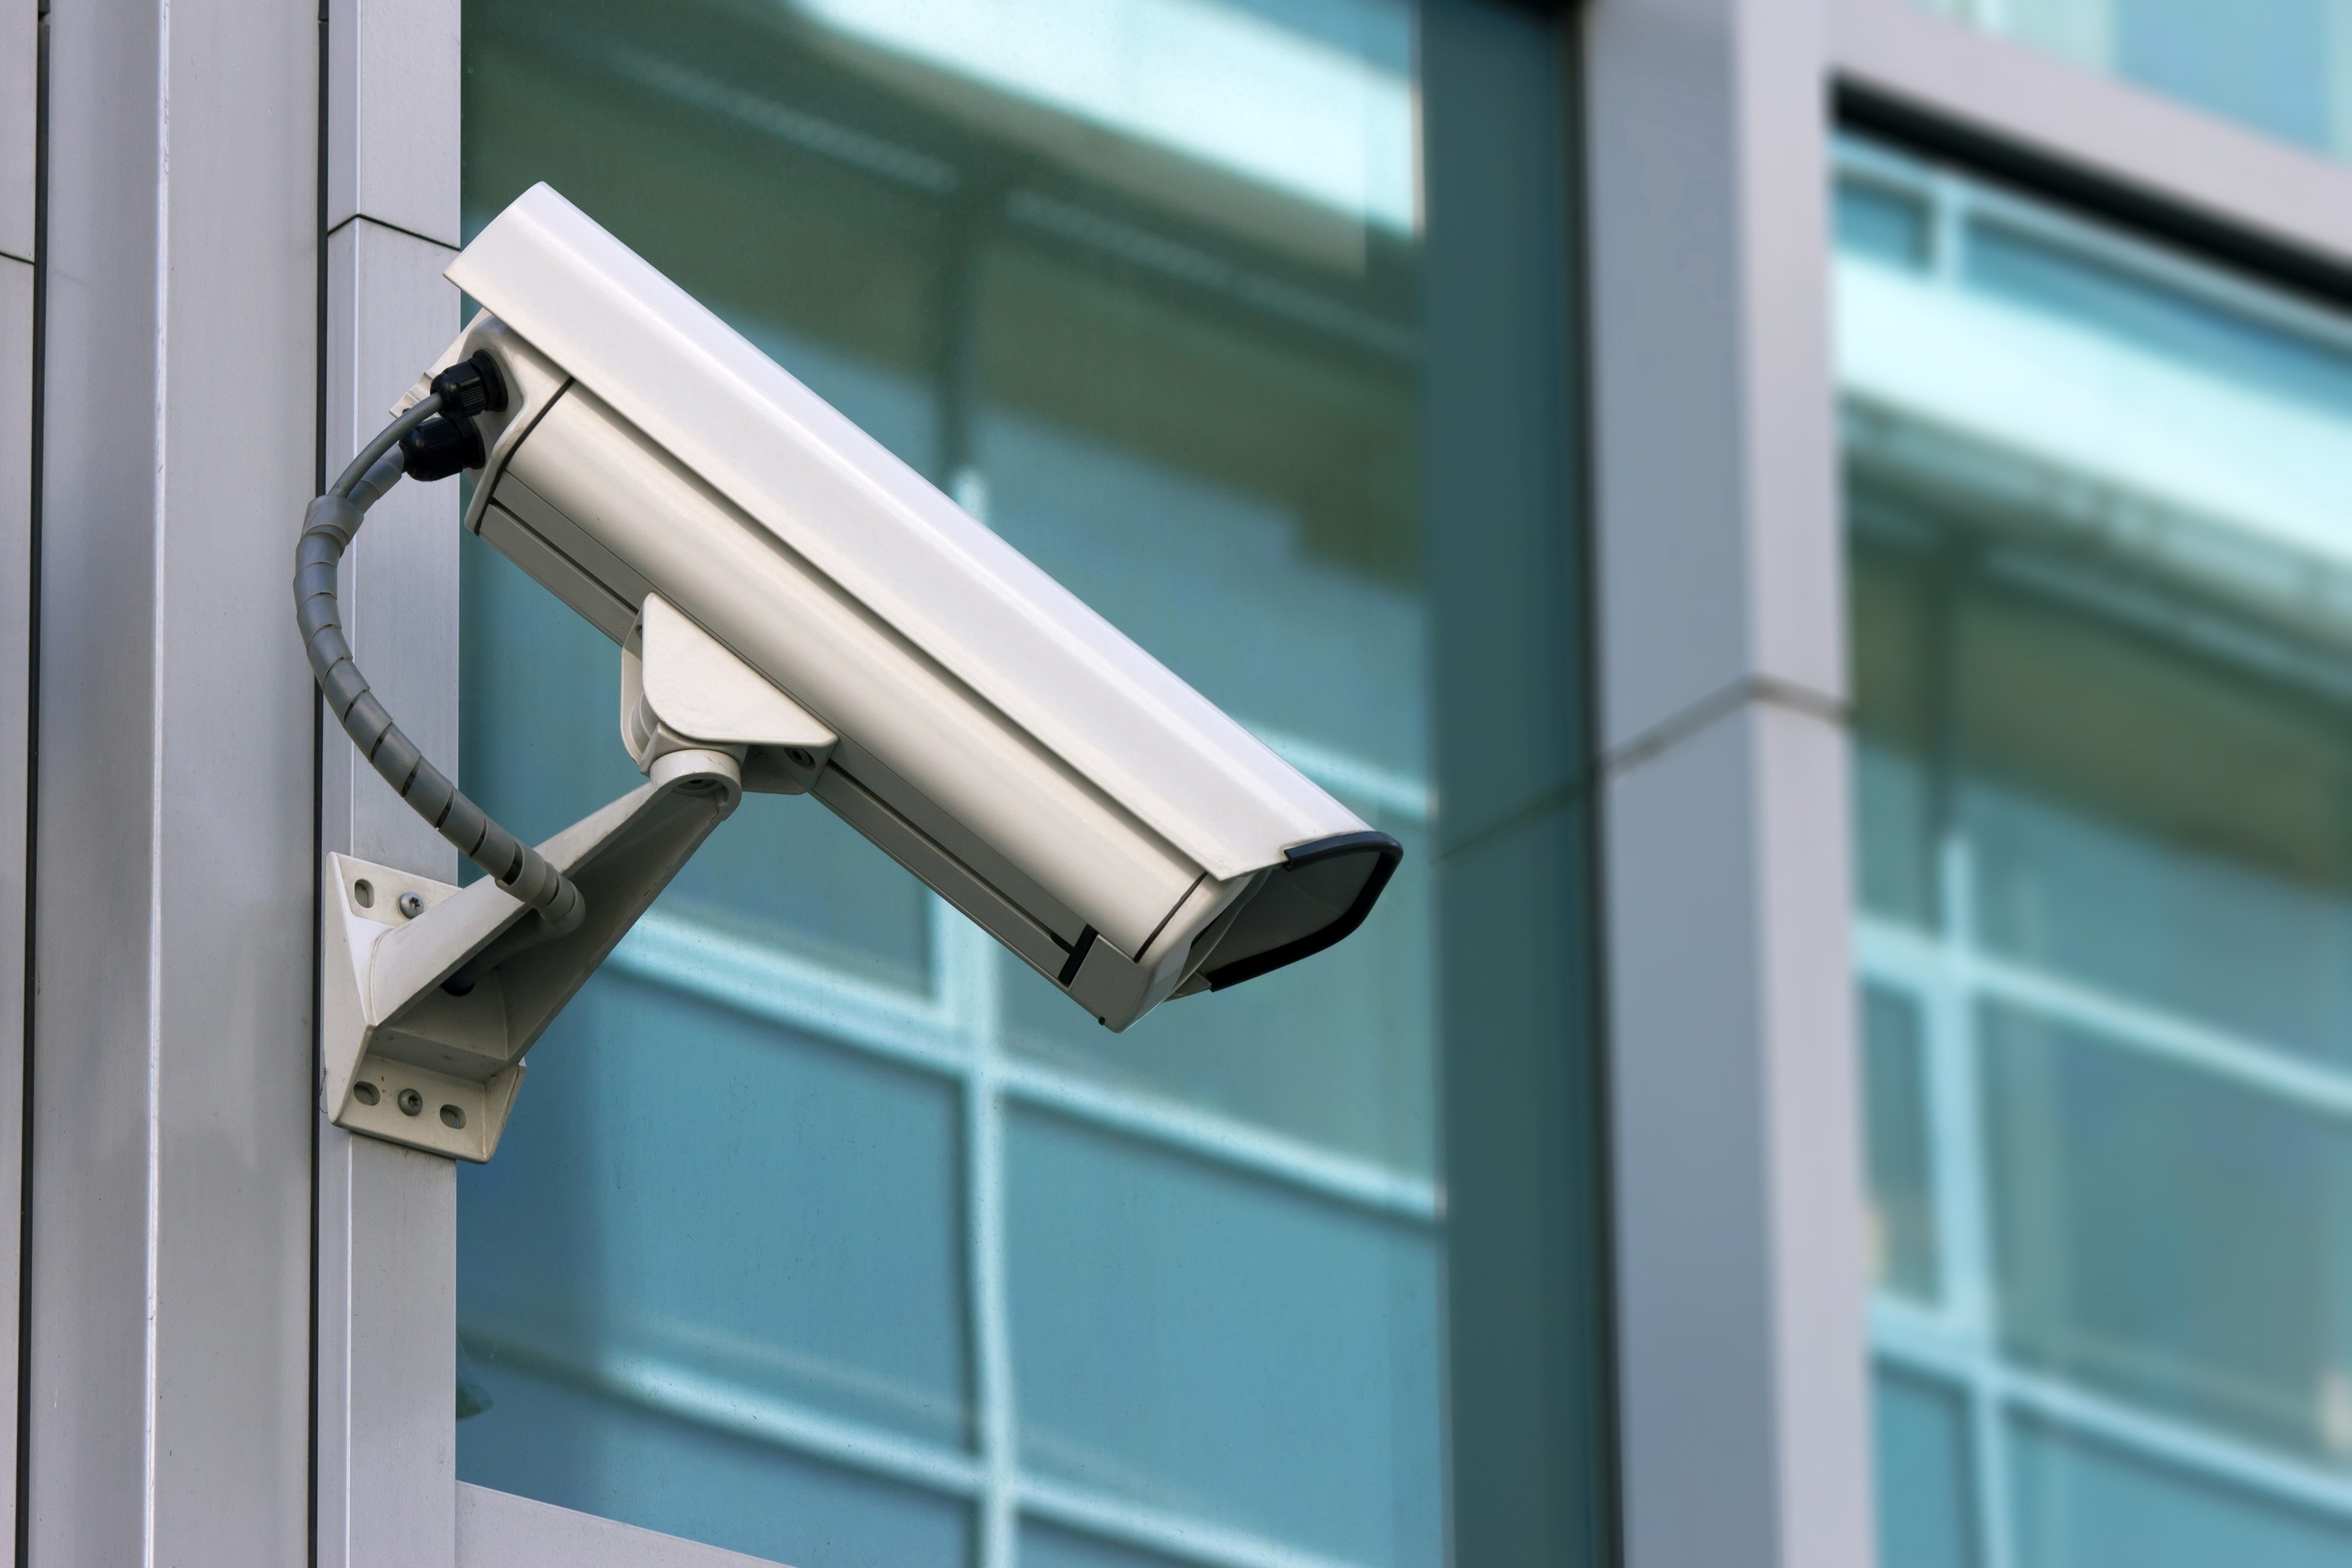 Cctv Camera Security   Stock Photos Images HD Wallpaper HD 3900x2600